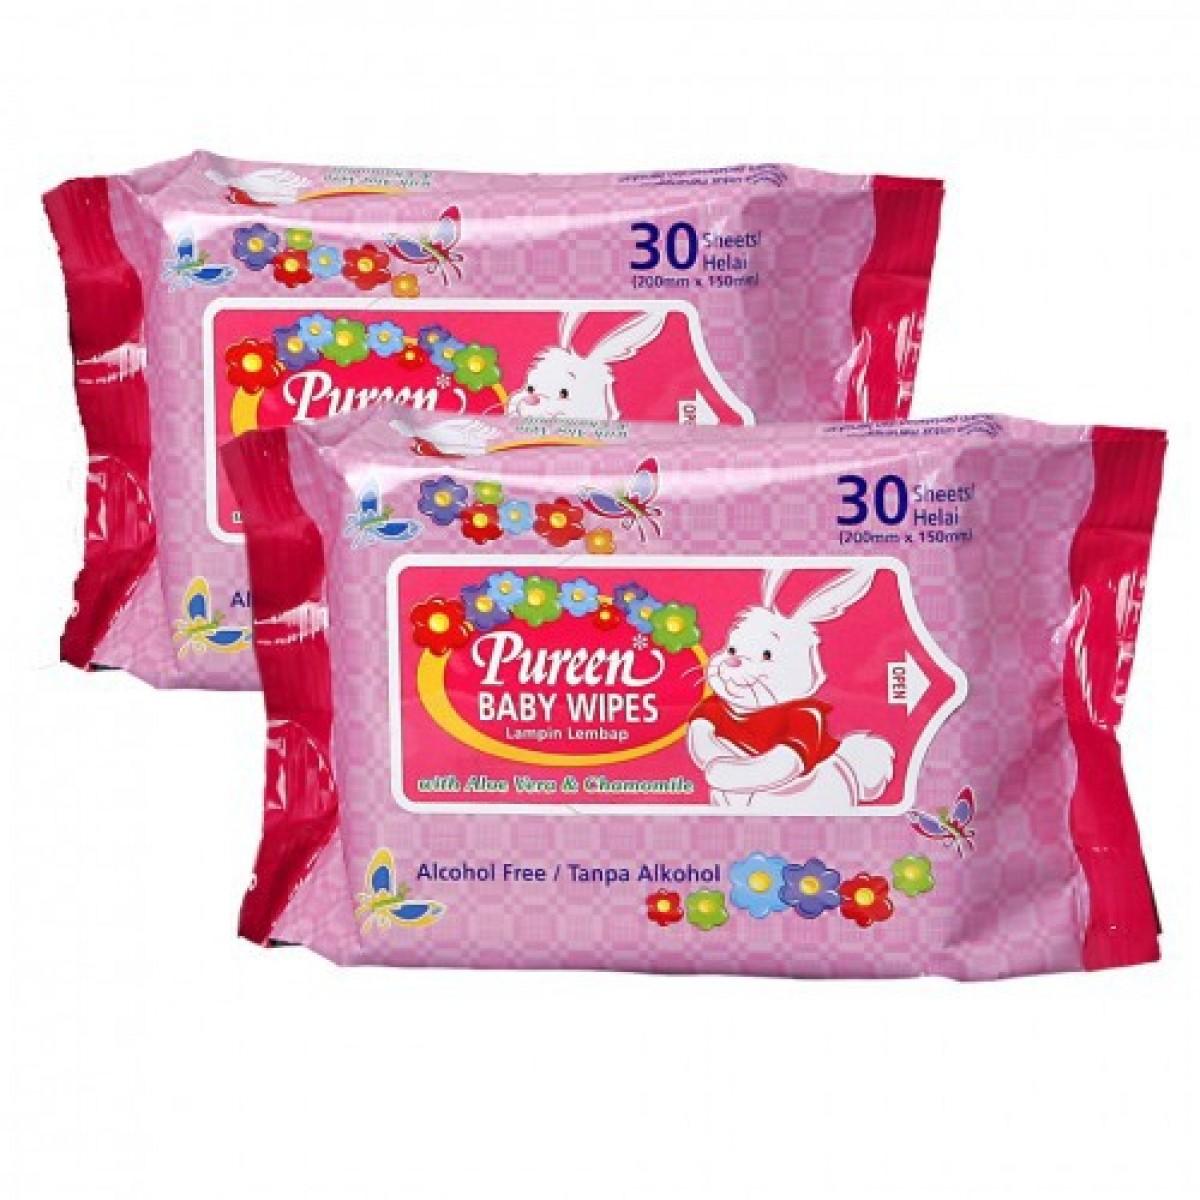 Pureen Baby Wipes (30 sheet) - Kico Baby Center